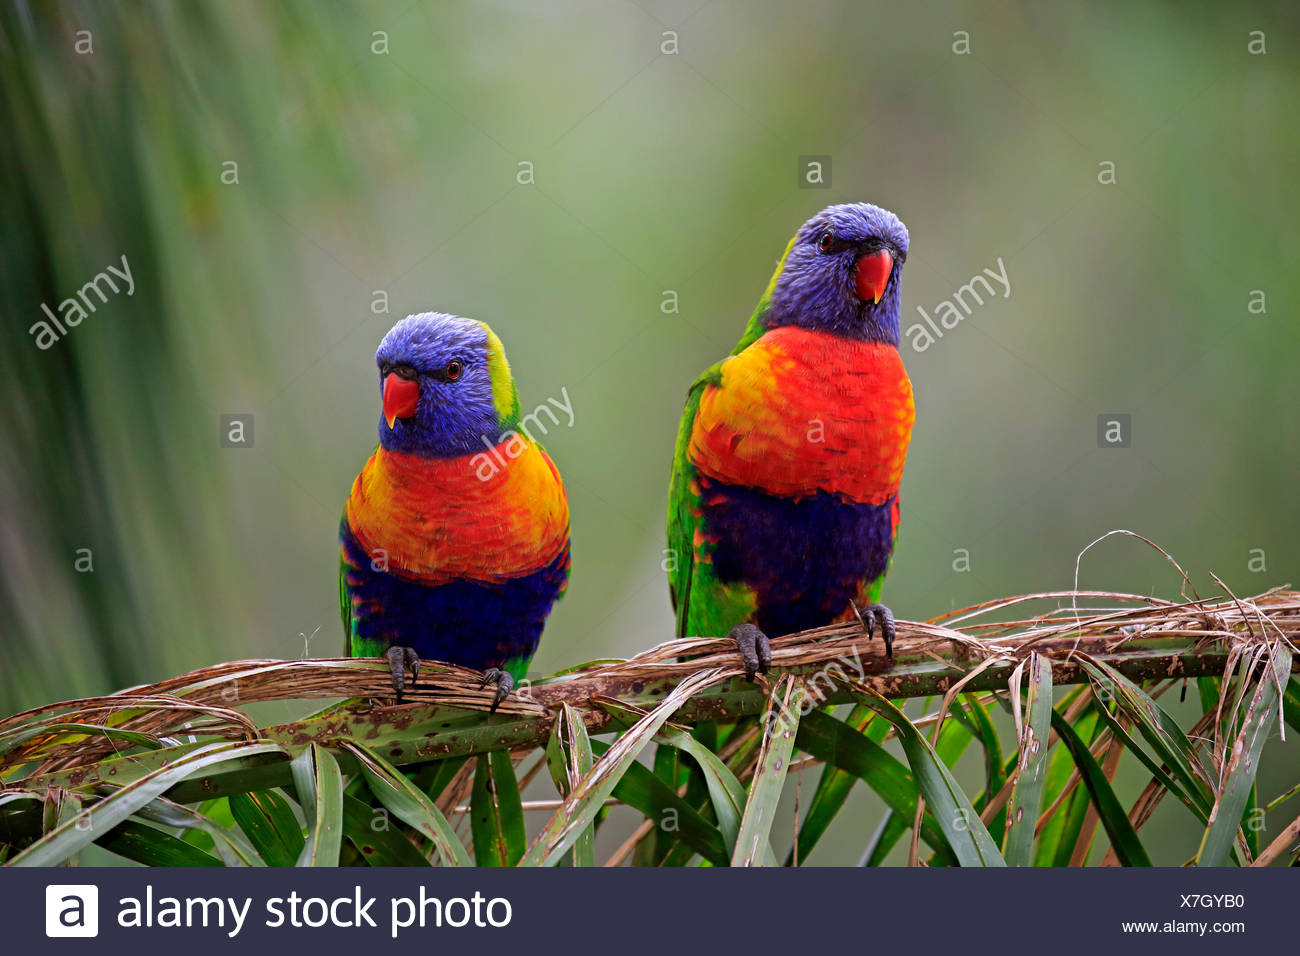 Rainbow Lorikeet (Trichoglossus haematodus), animal couple sitting on reed, Cuddly Creek, South Australia, Australia - Stock Image